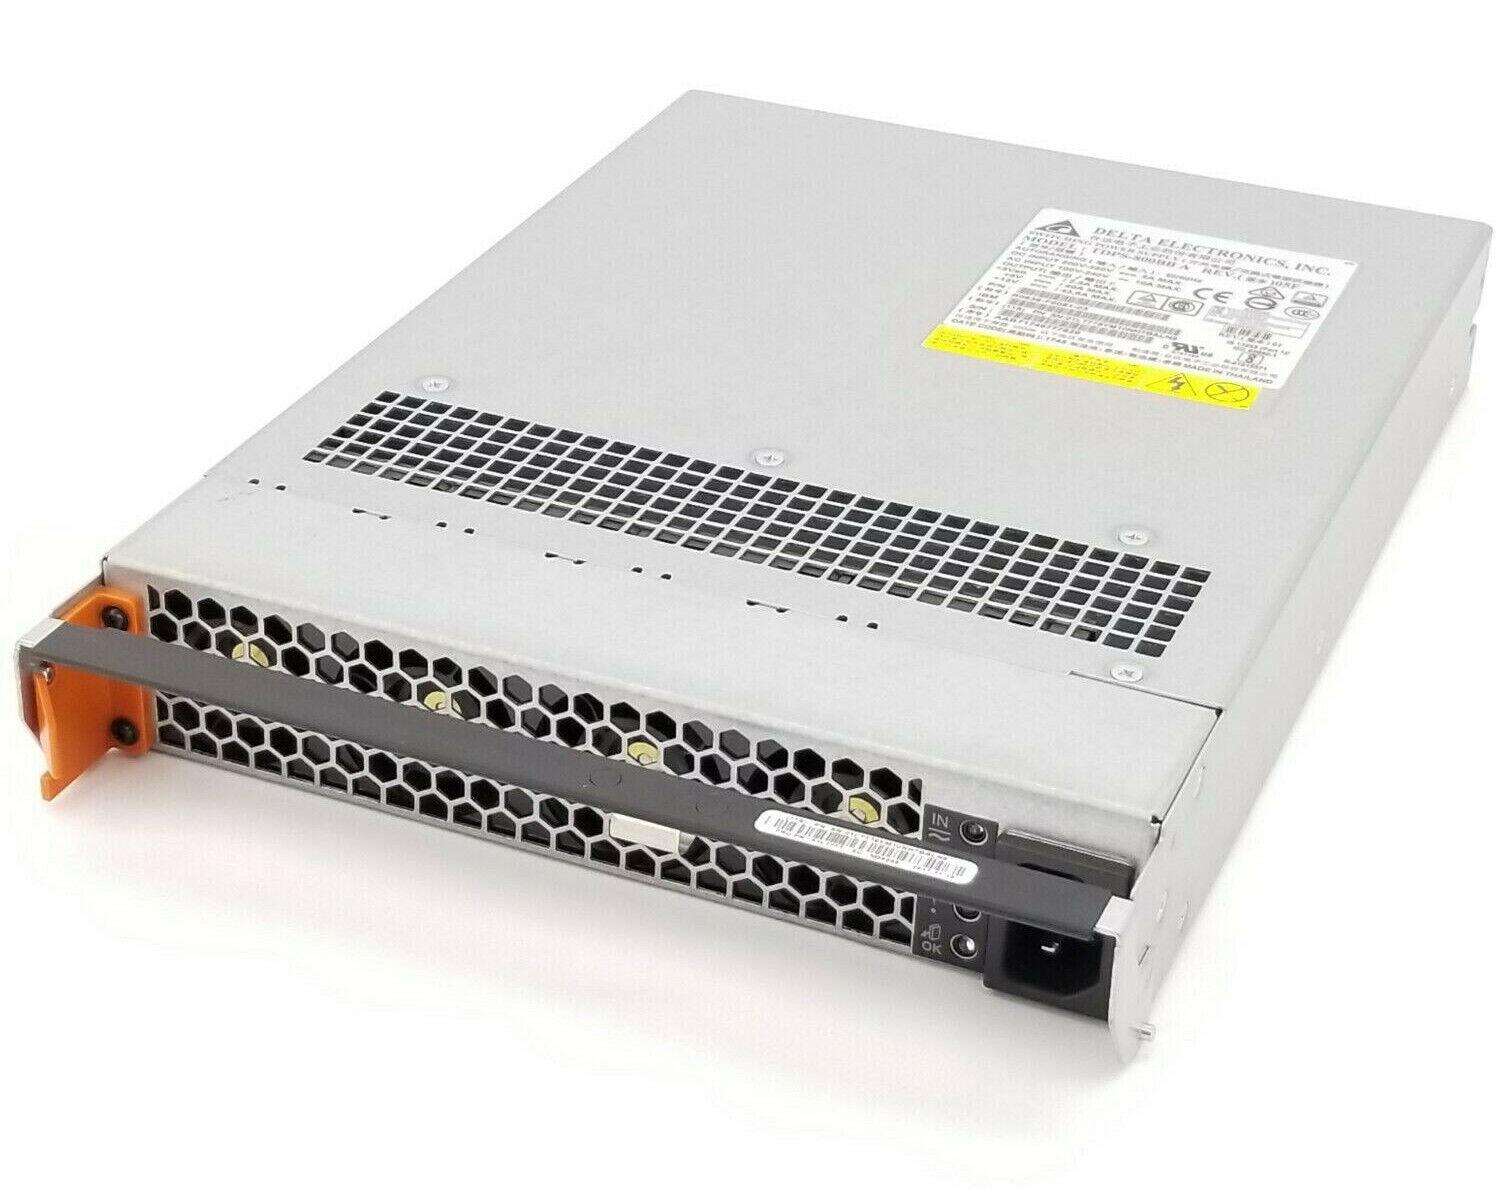 IBM Delta Electronics TDPS-800BB A 800W Watt Power Supply PSU 0170-0010